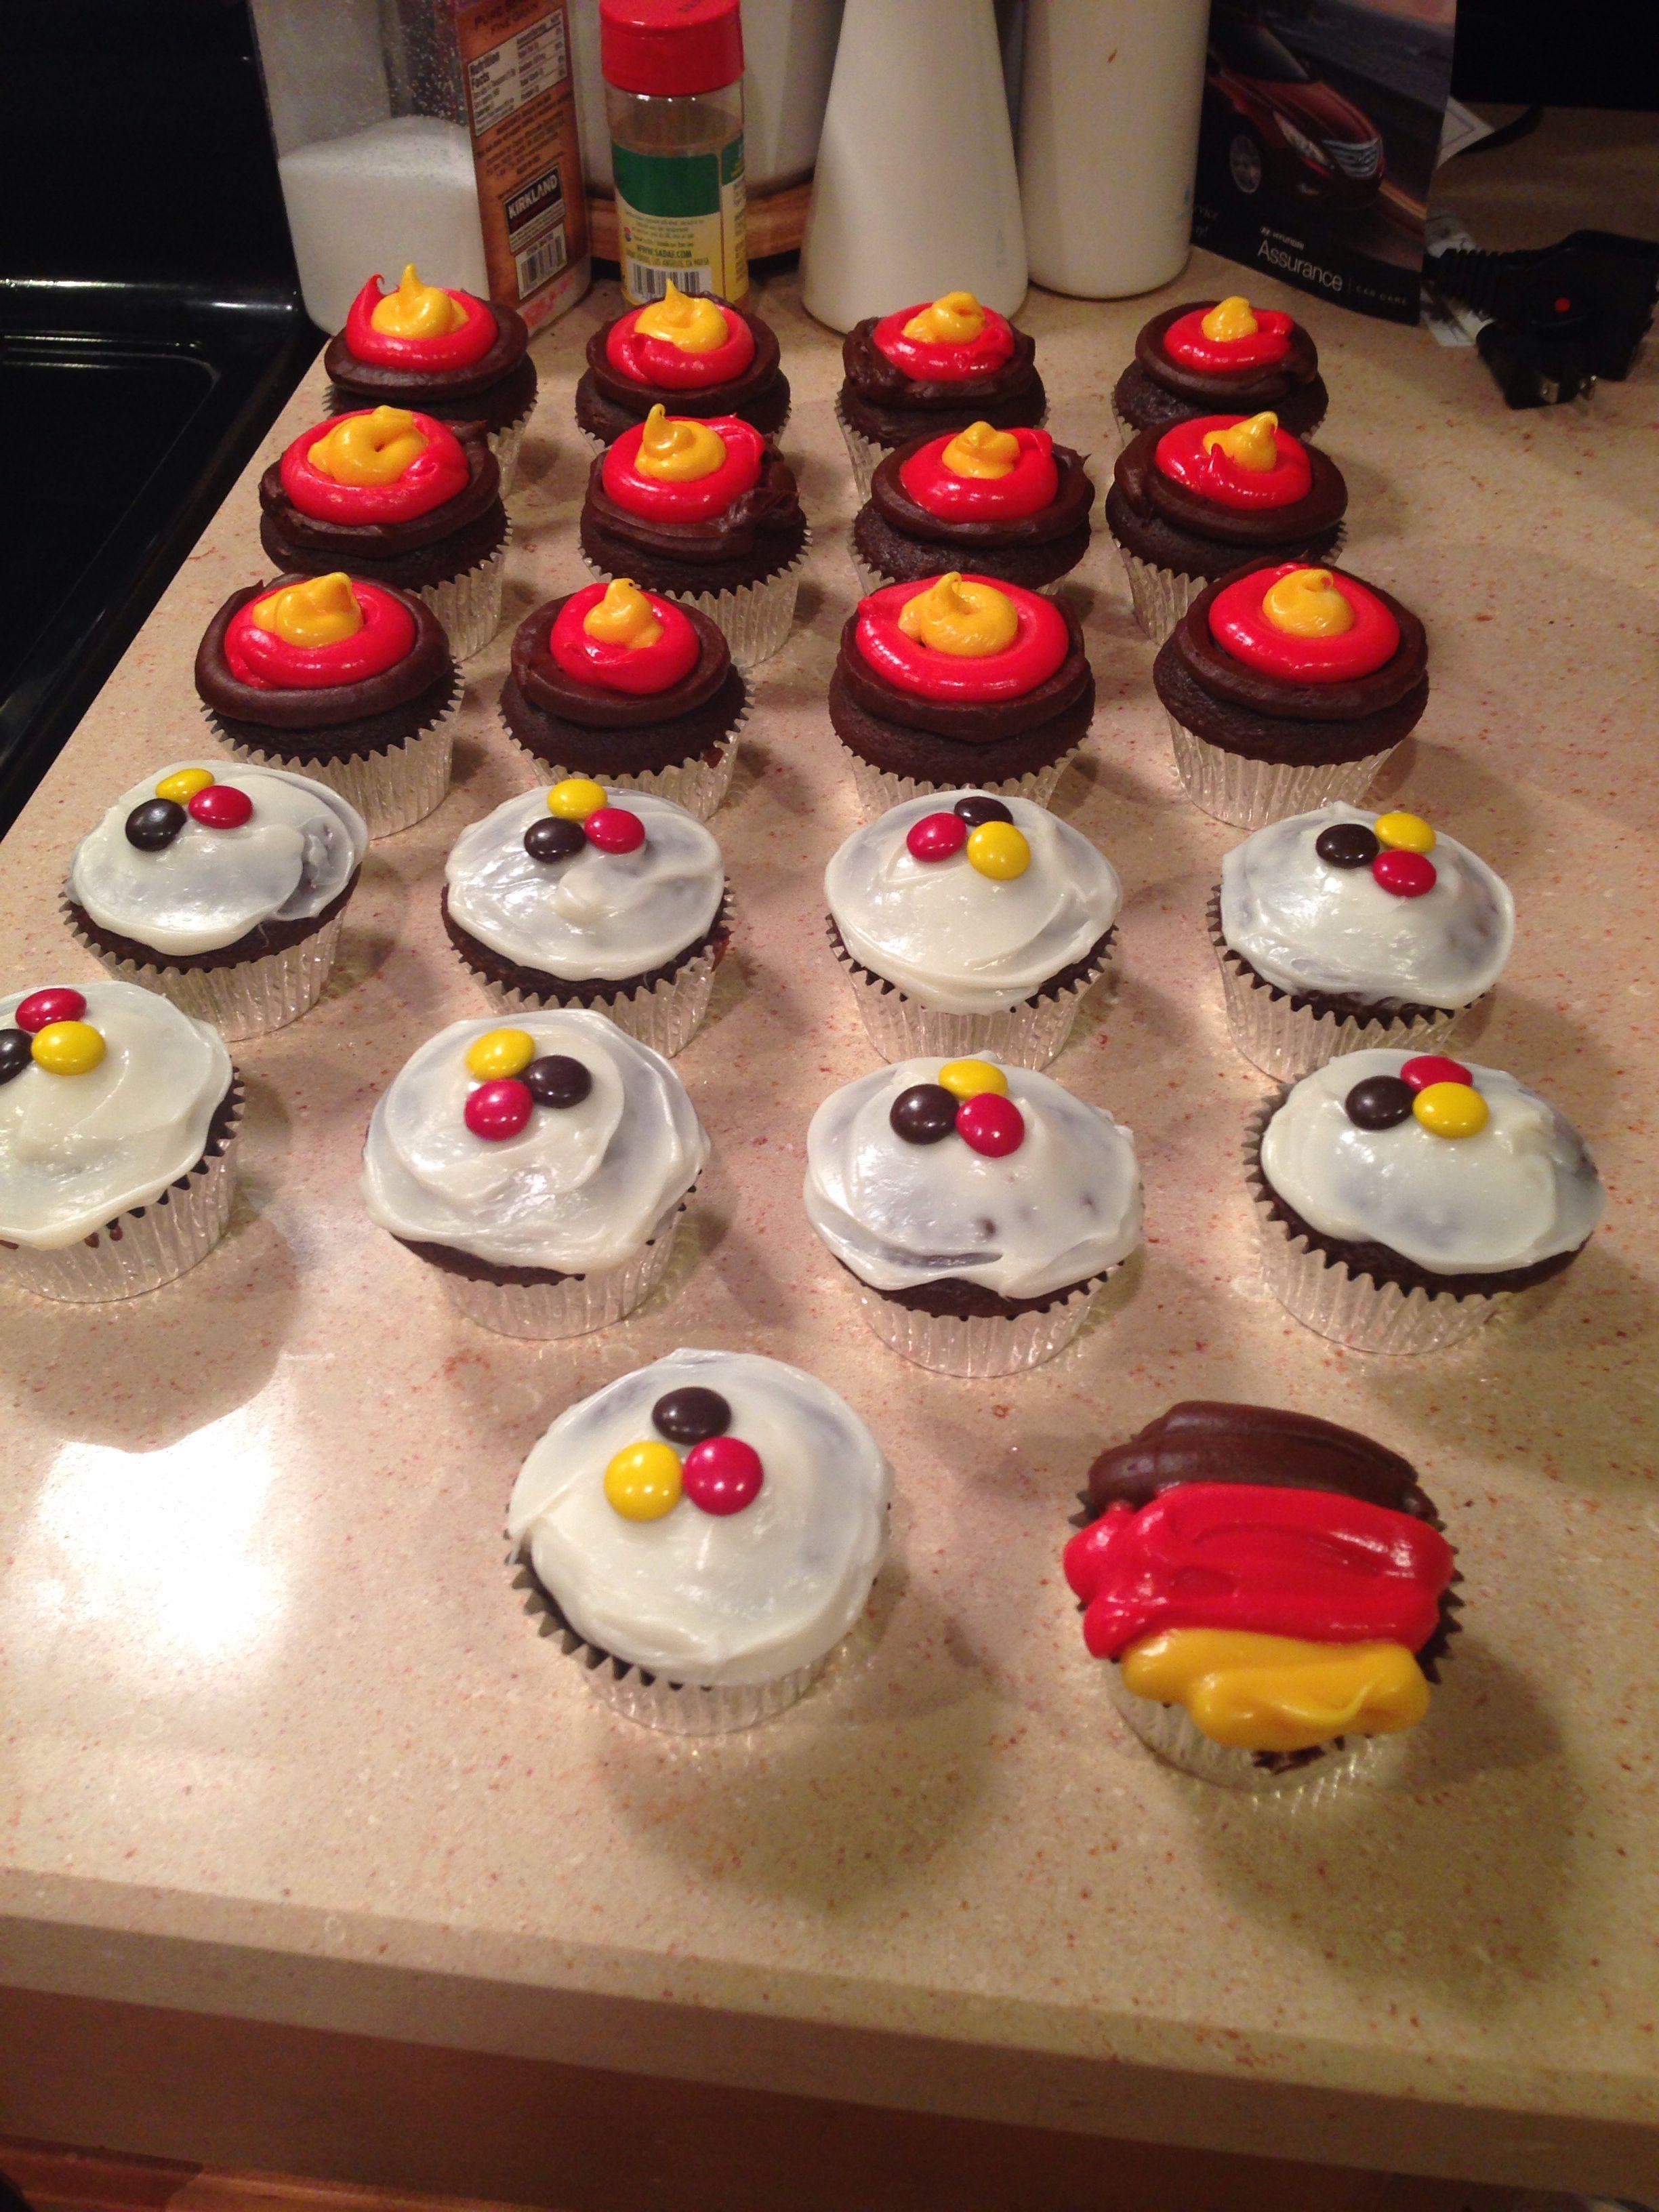 German Flag Cupcakes Cupcake Flags, Oktoberfest Party, German Baking,  Themed Cupcakes, Football